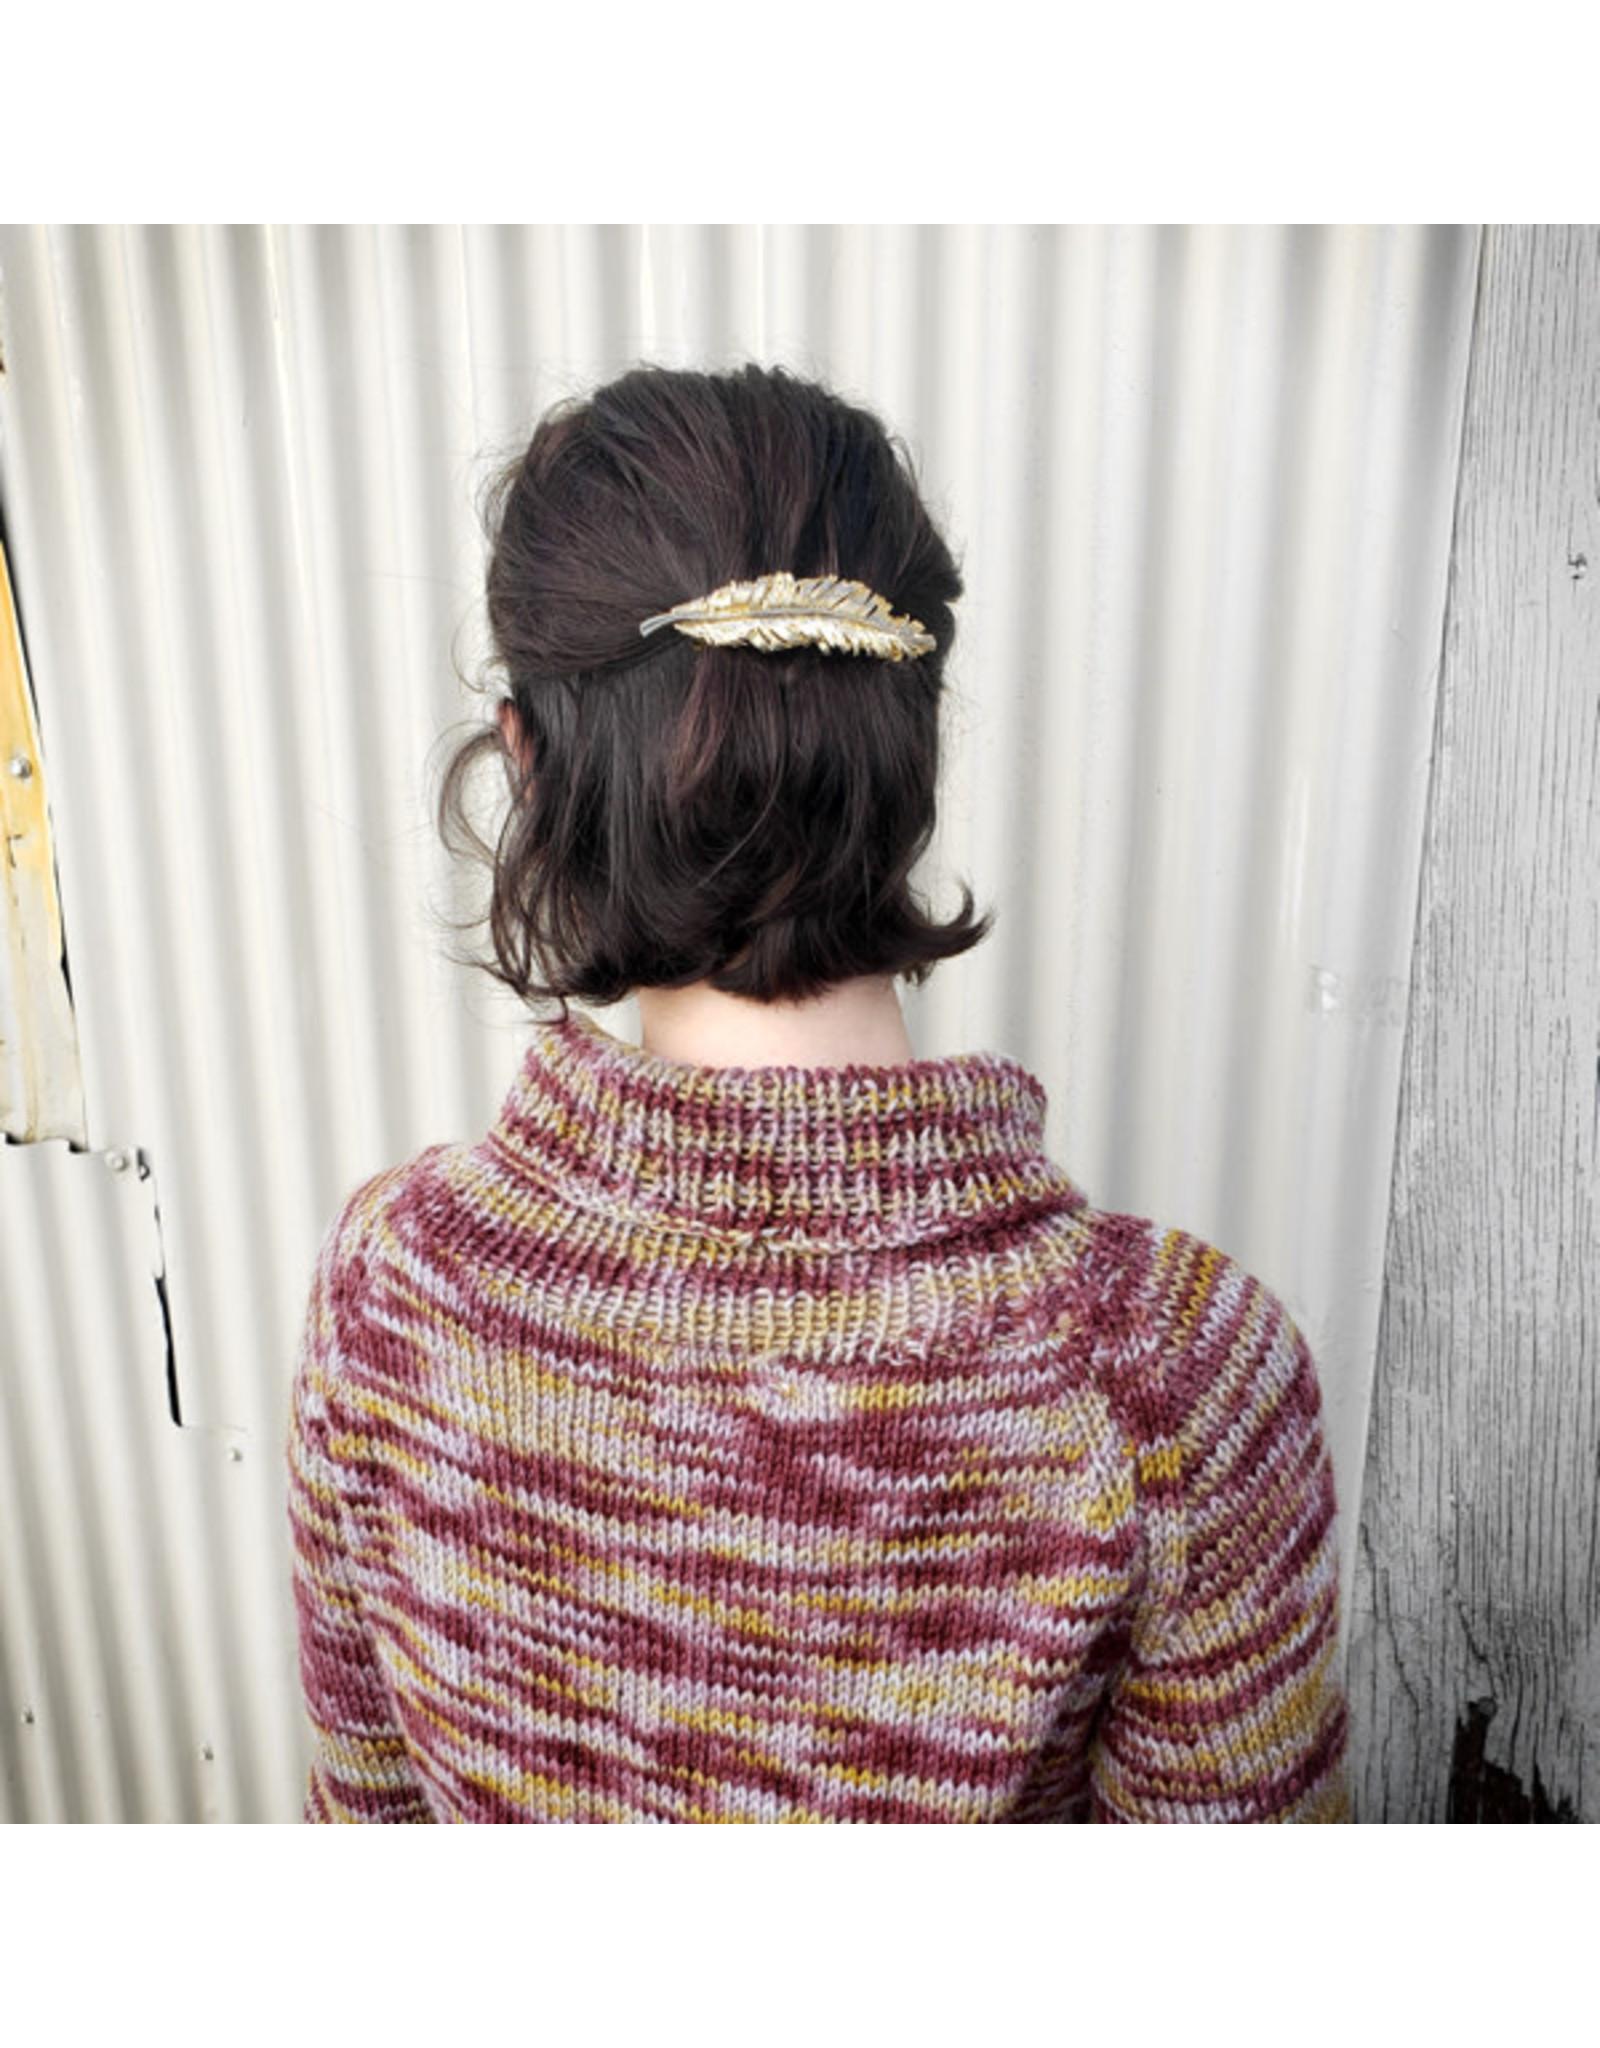 Devil May Wear Cranberry Lemon Turtleneck Sweater. Hand Dyed, Hand Knit. 100% Wool.